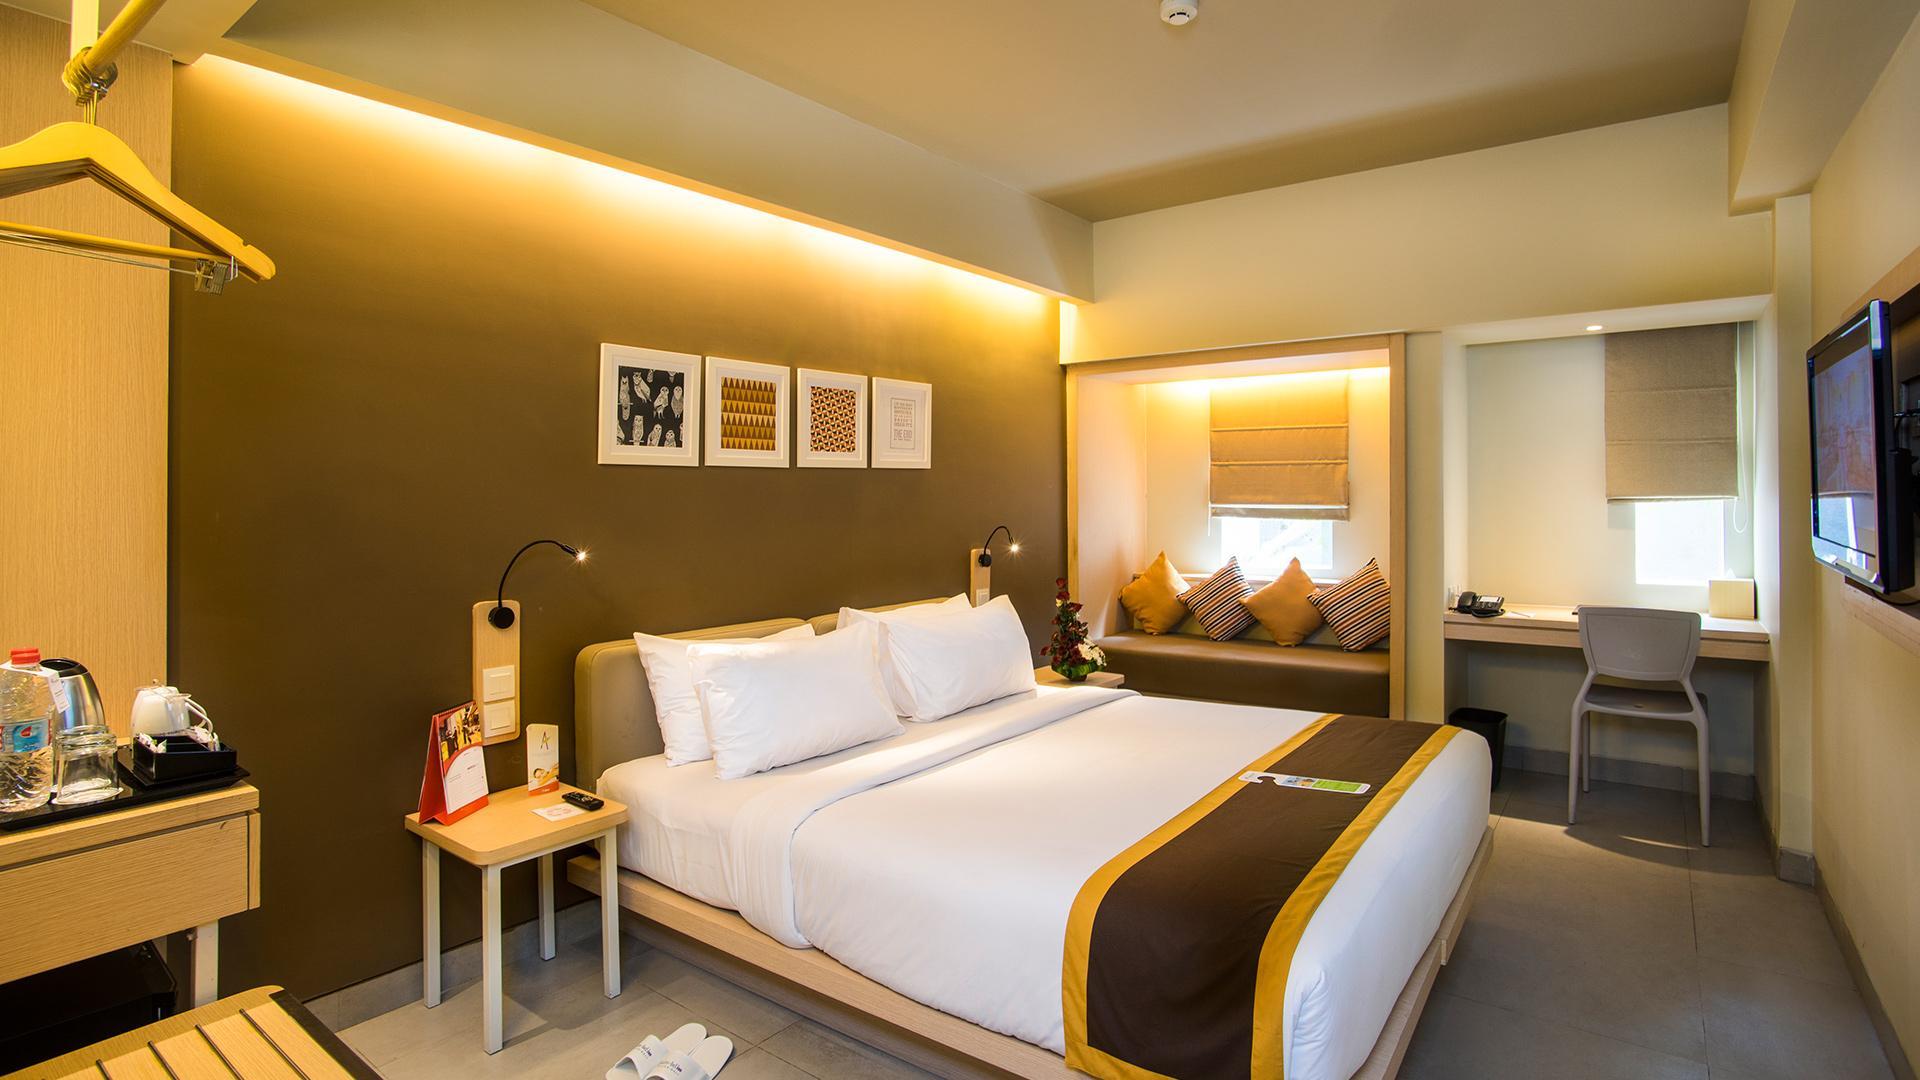 Standard Room image 1 at Swiss-Belinn Legian by Kabupaten Badung, Bali, Indonesia